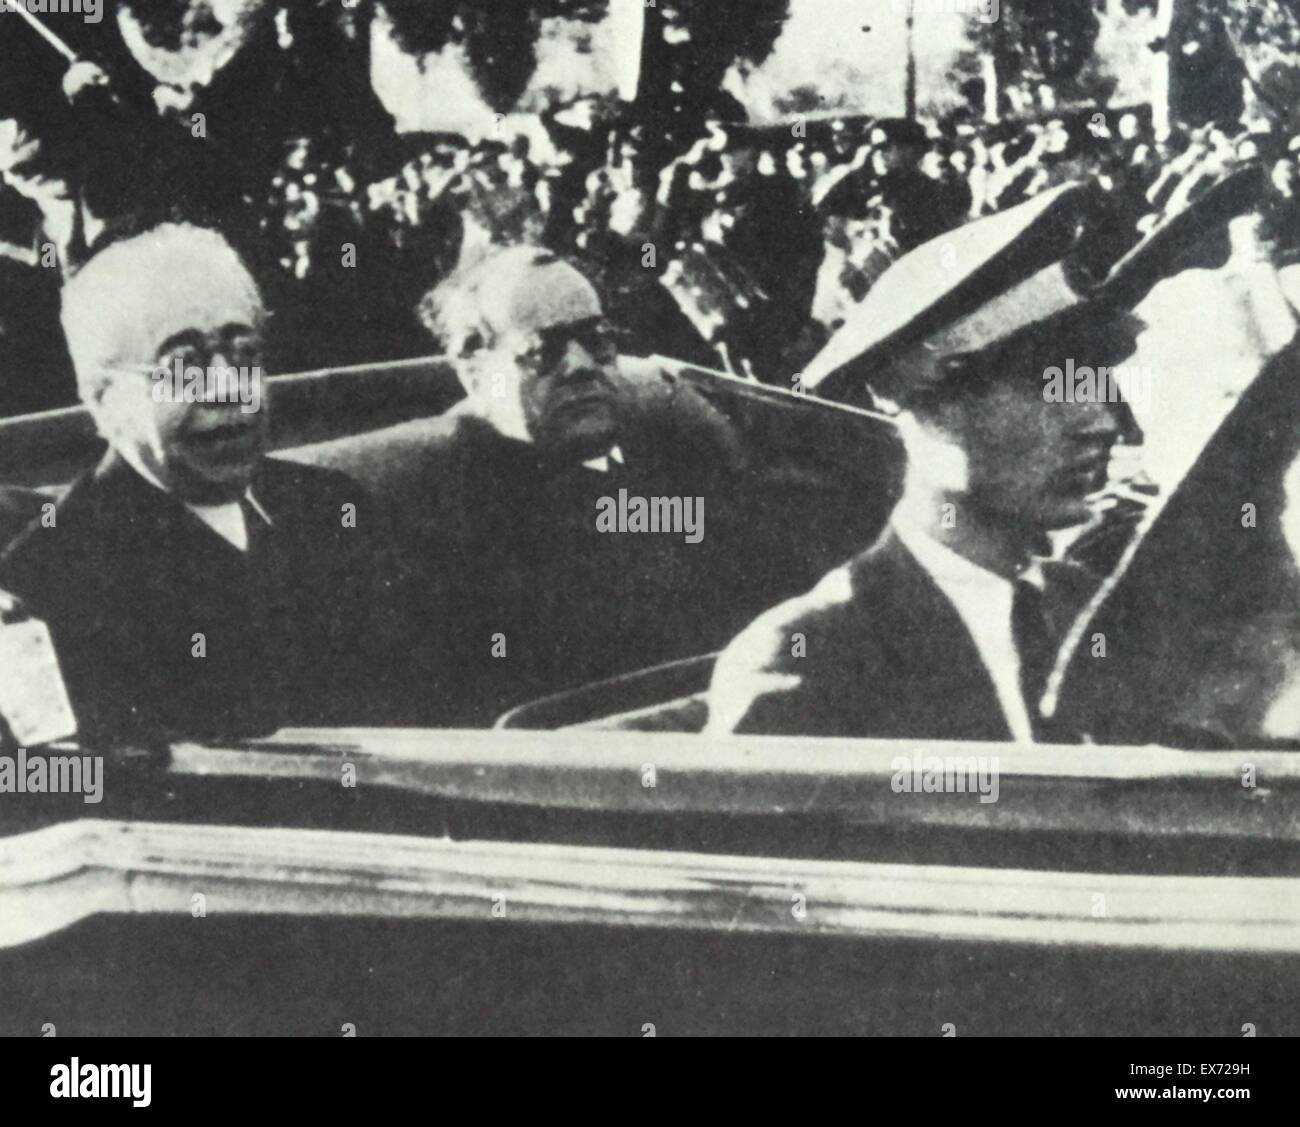 Republican political leaders, Manuel Azana and Juan Negrín during the Spanish Civil War - Stock Image